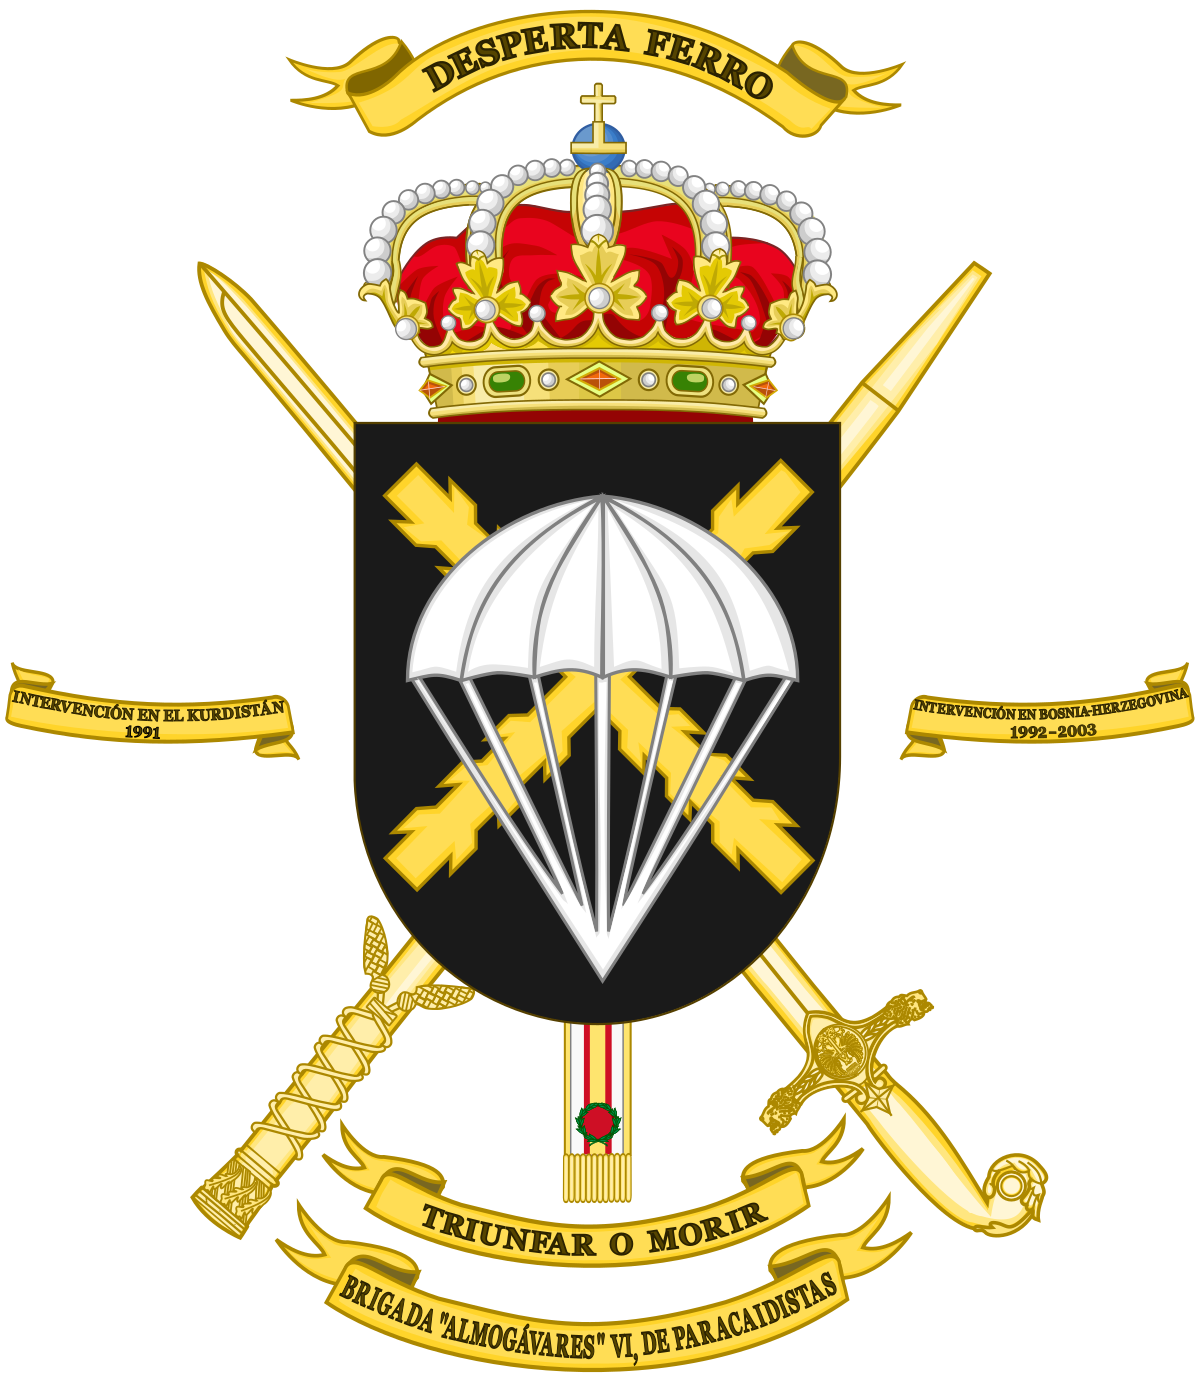 Paratrooper Brigade (Spain).